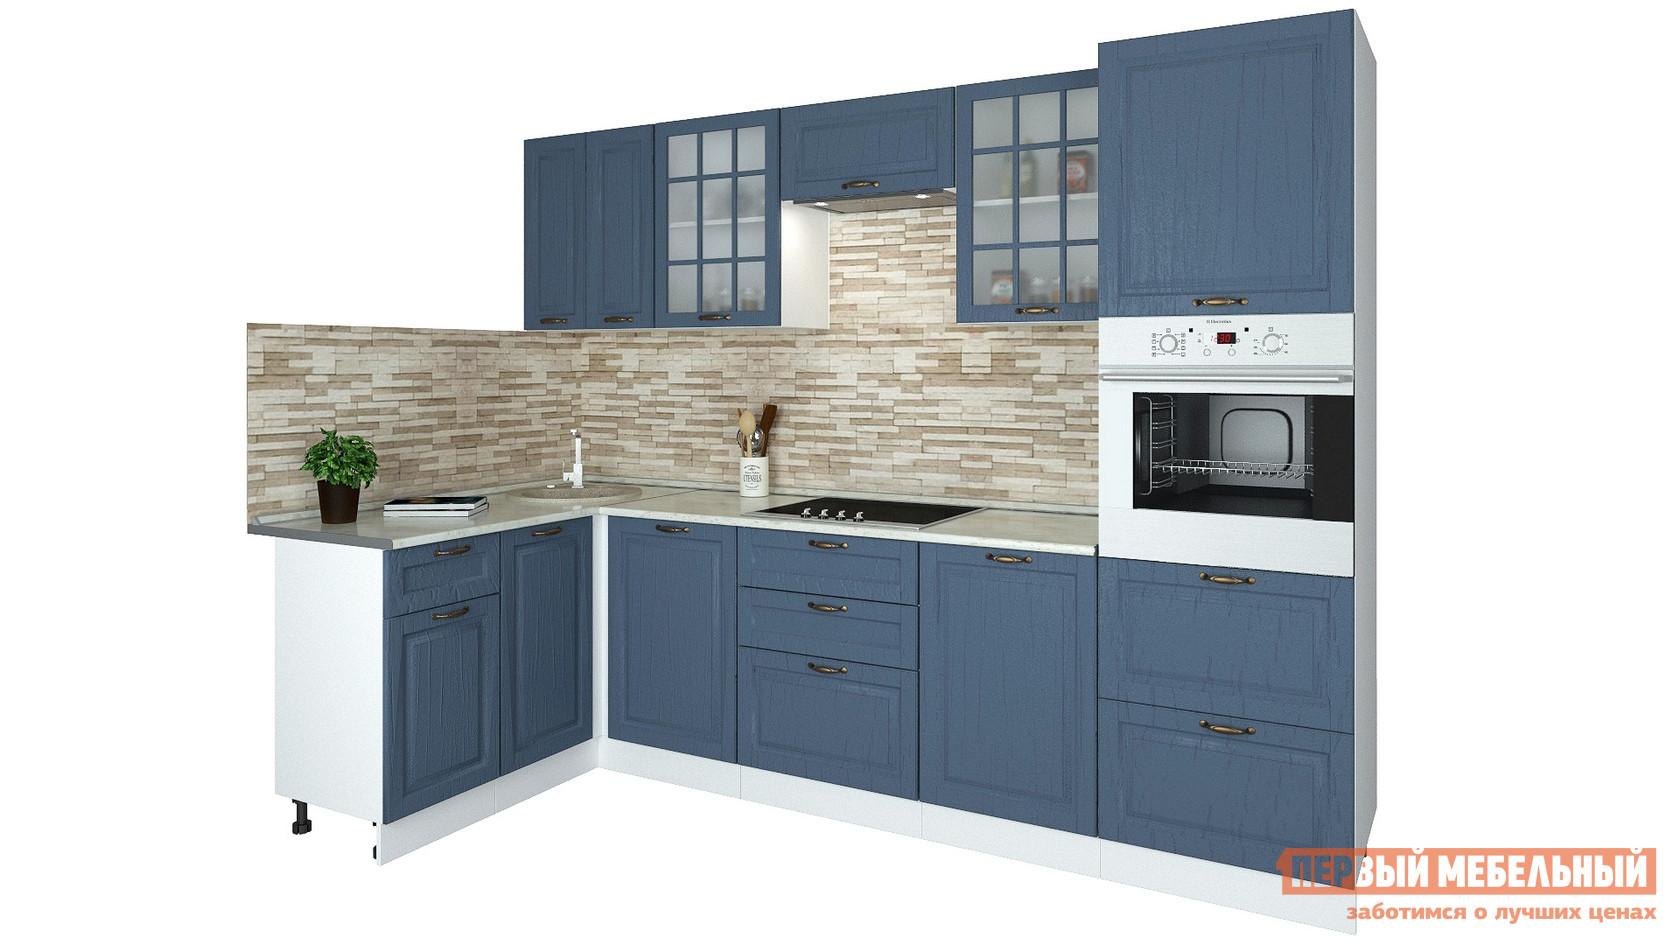 Угловой кухонный гарнитур Первый Мебельный Кухня Палермо 2,8х1,5 м